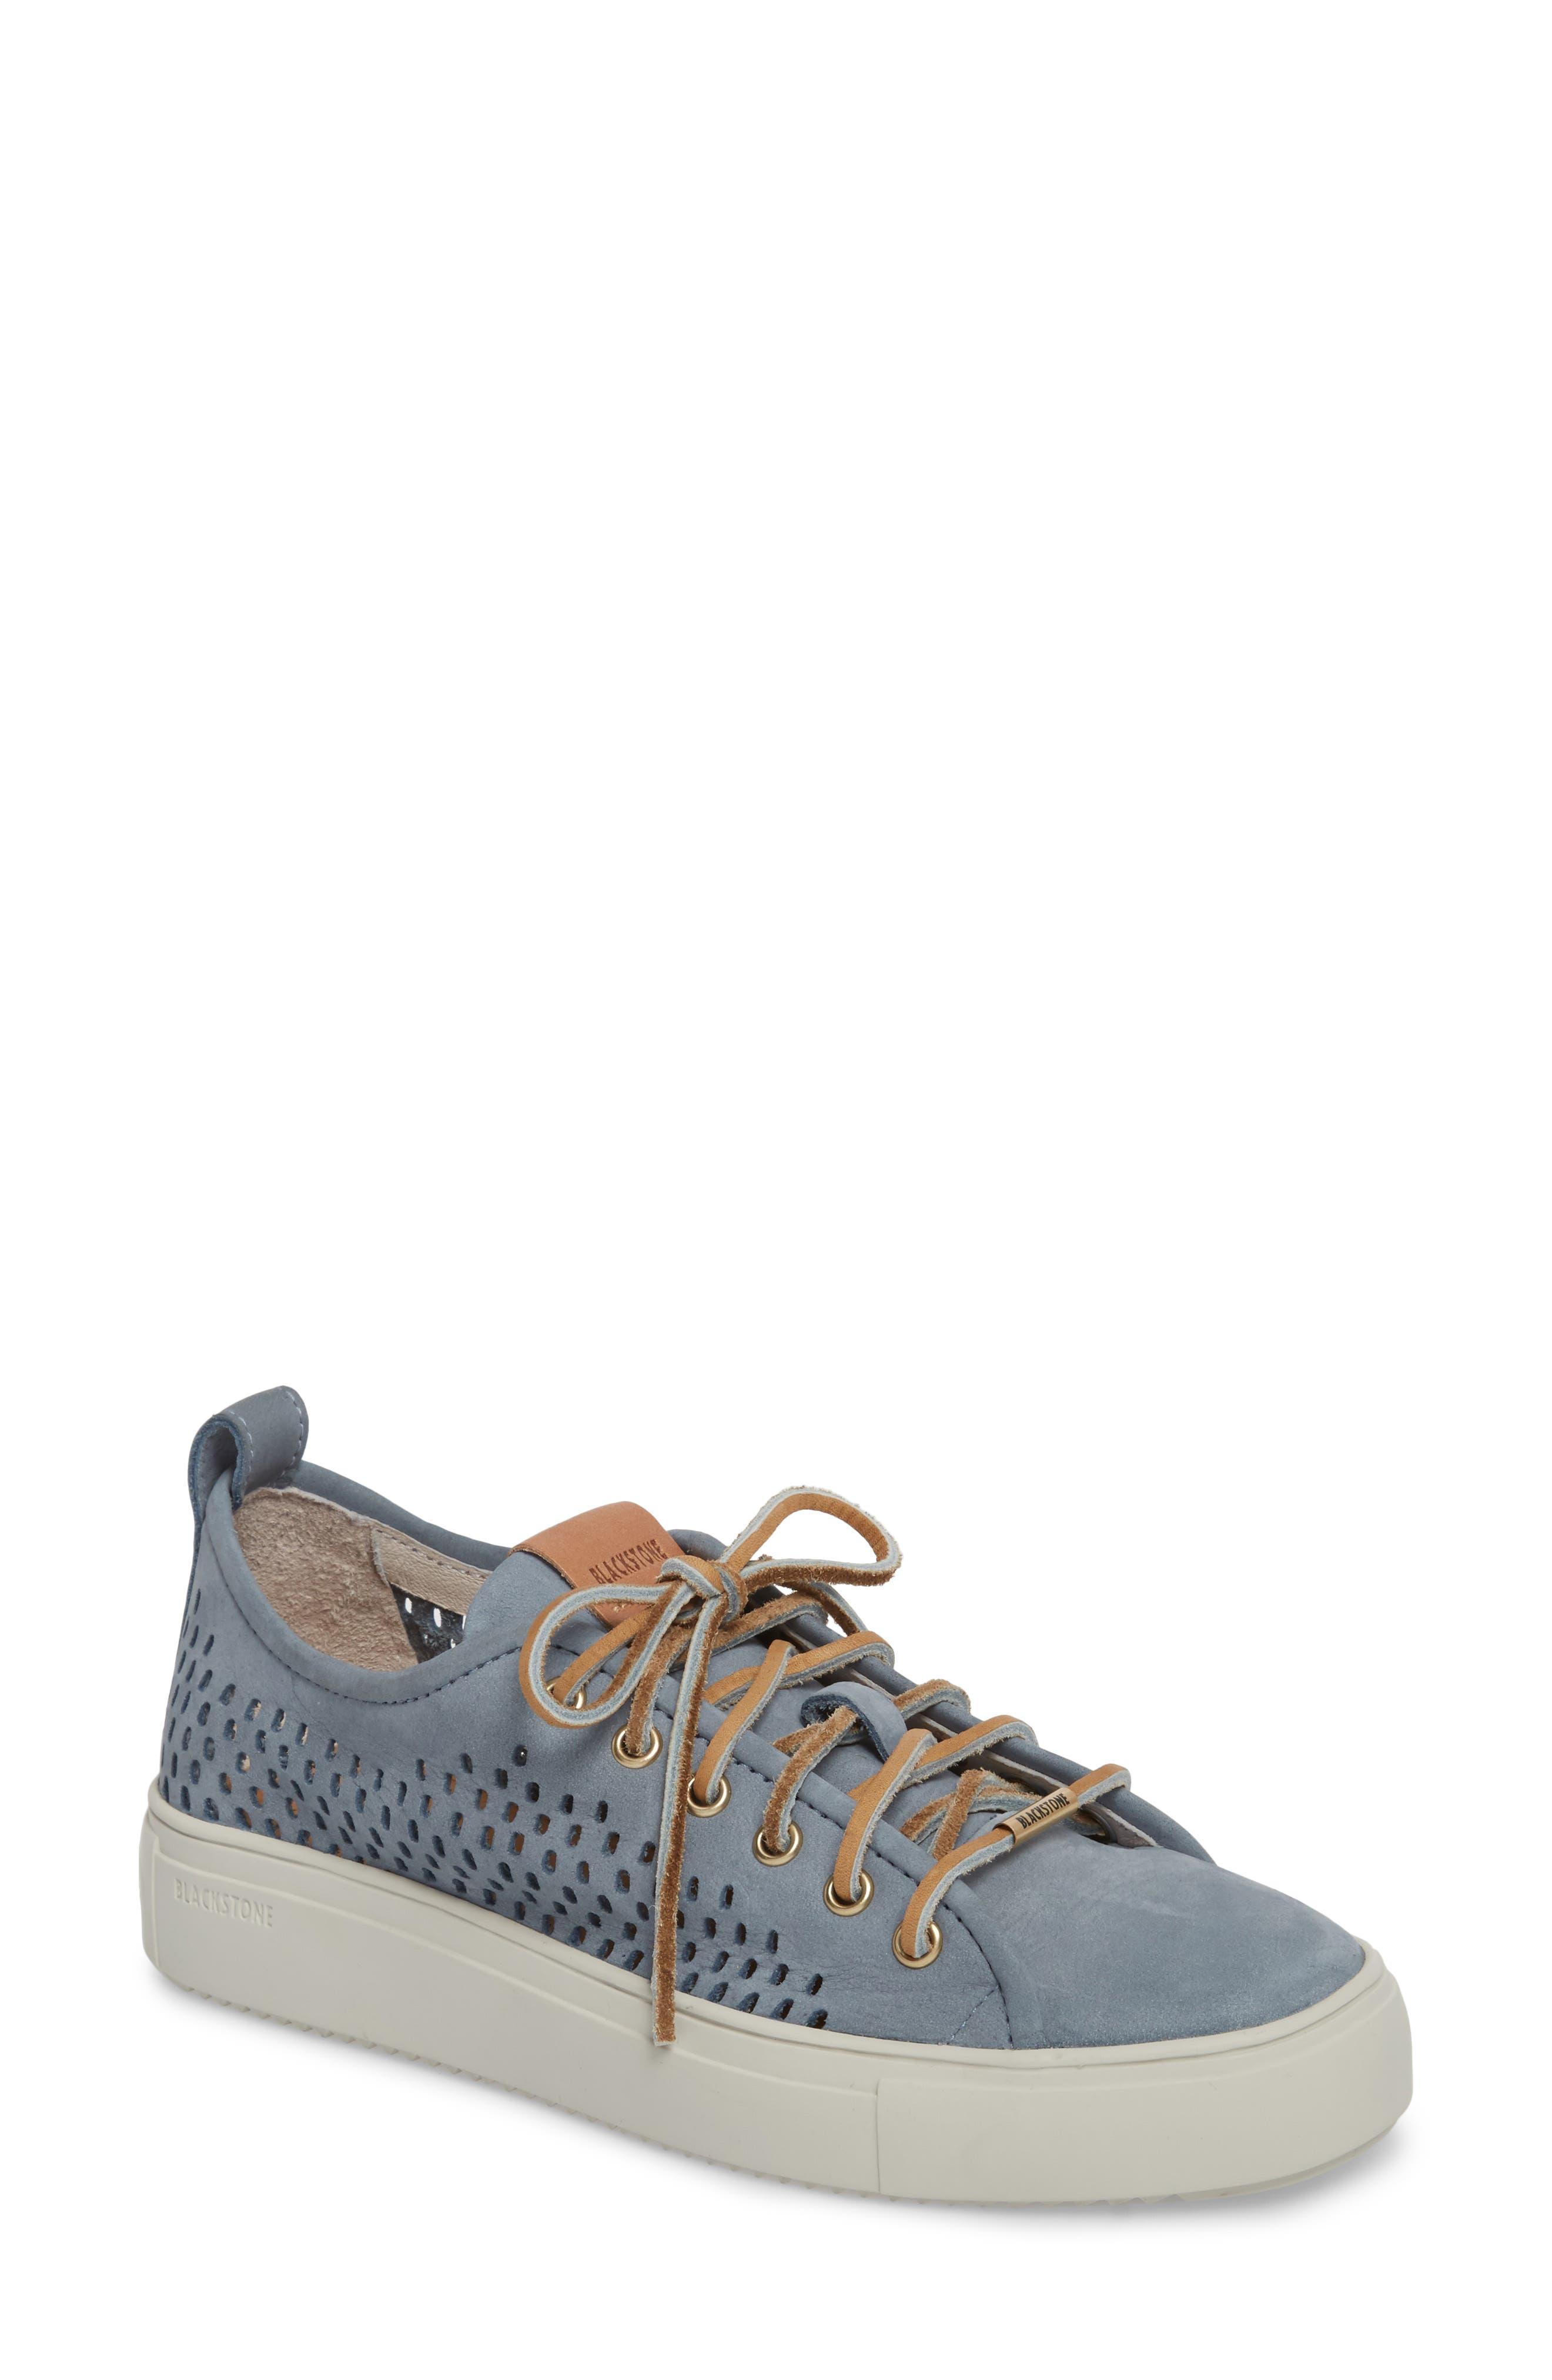 PL87 Sneaker,                         Main,                         color, Winter Sky Leather